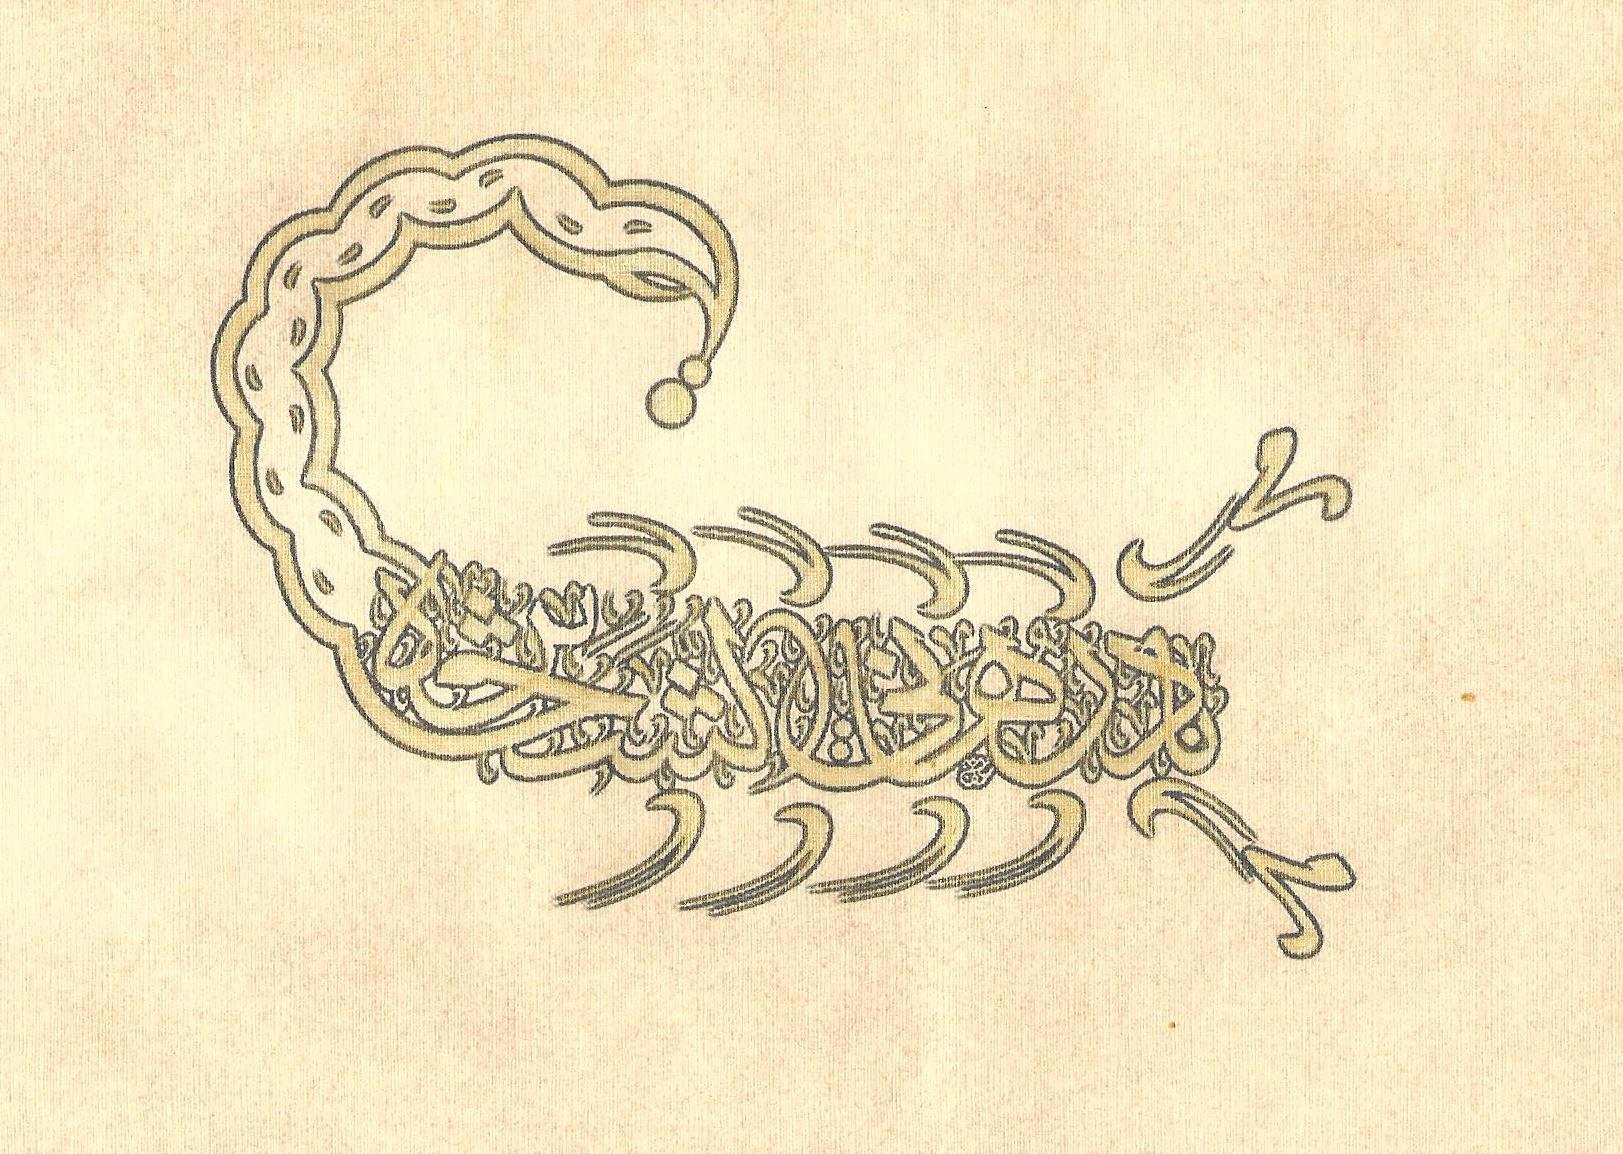 1623x1154 Indian Islam Calligraphy Art Handmade Turkish Persian Arabic